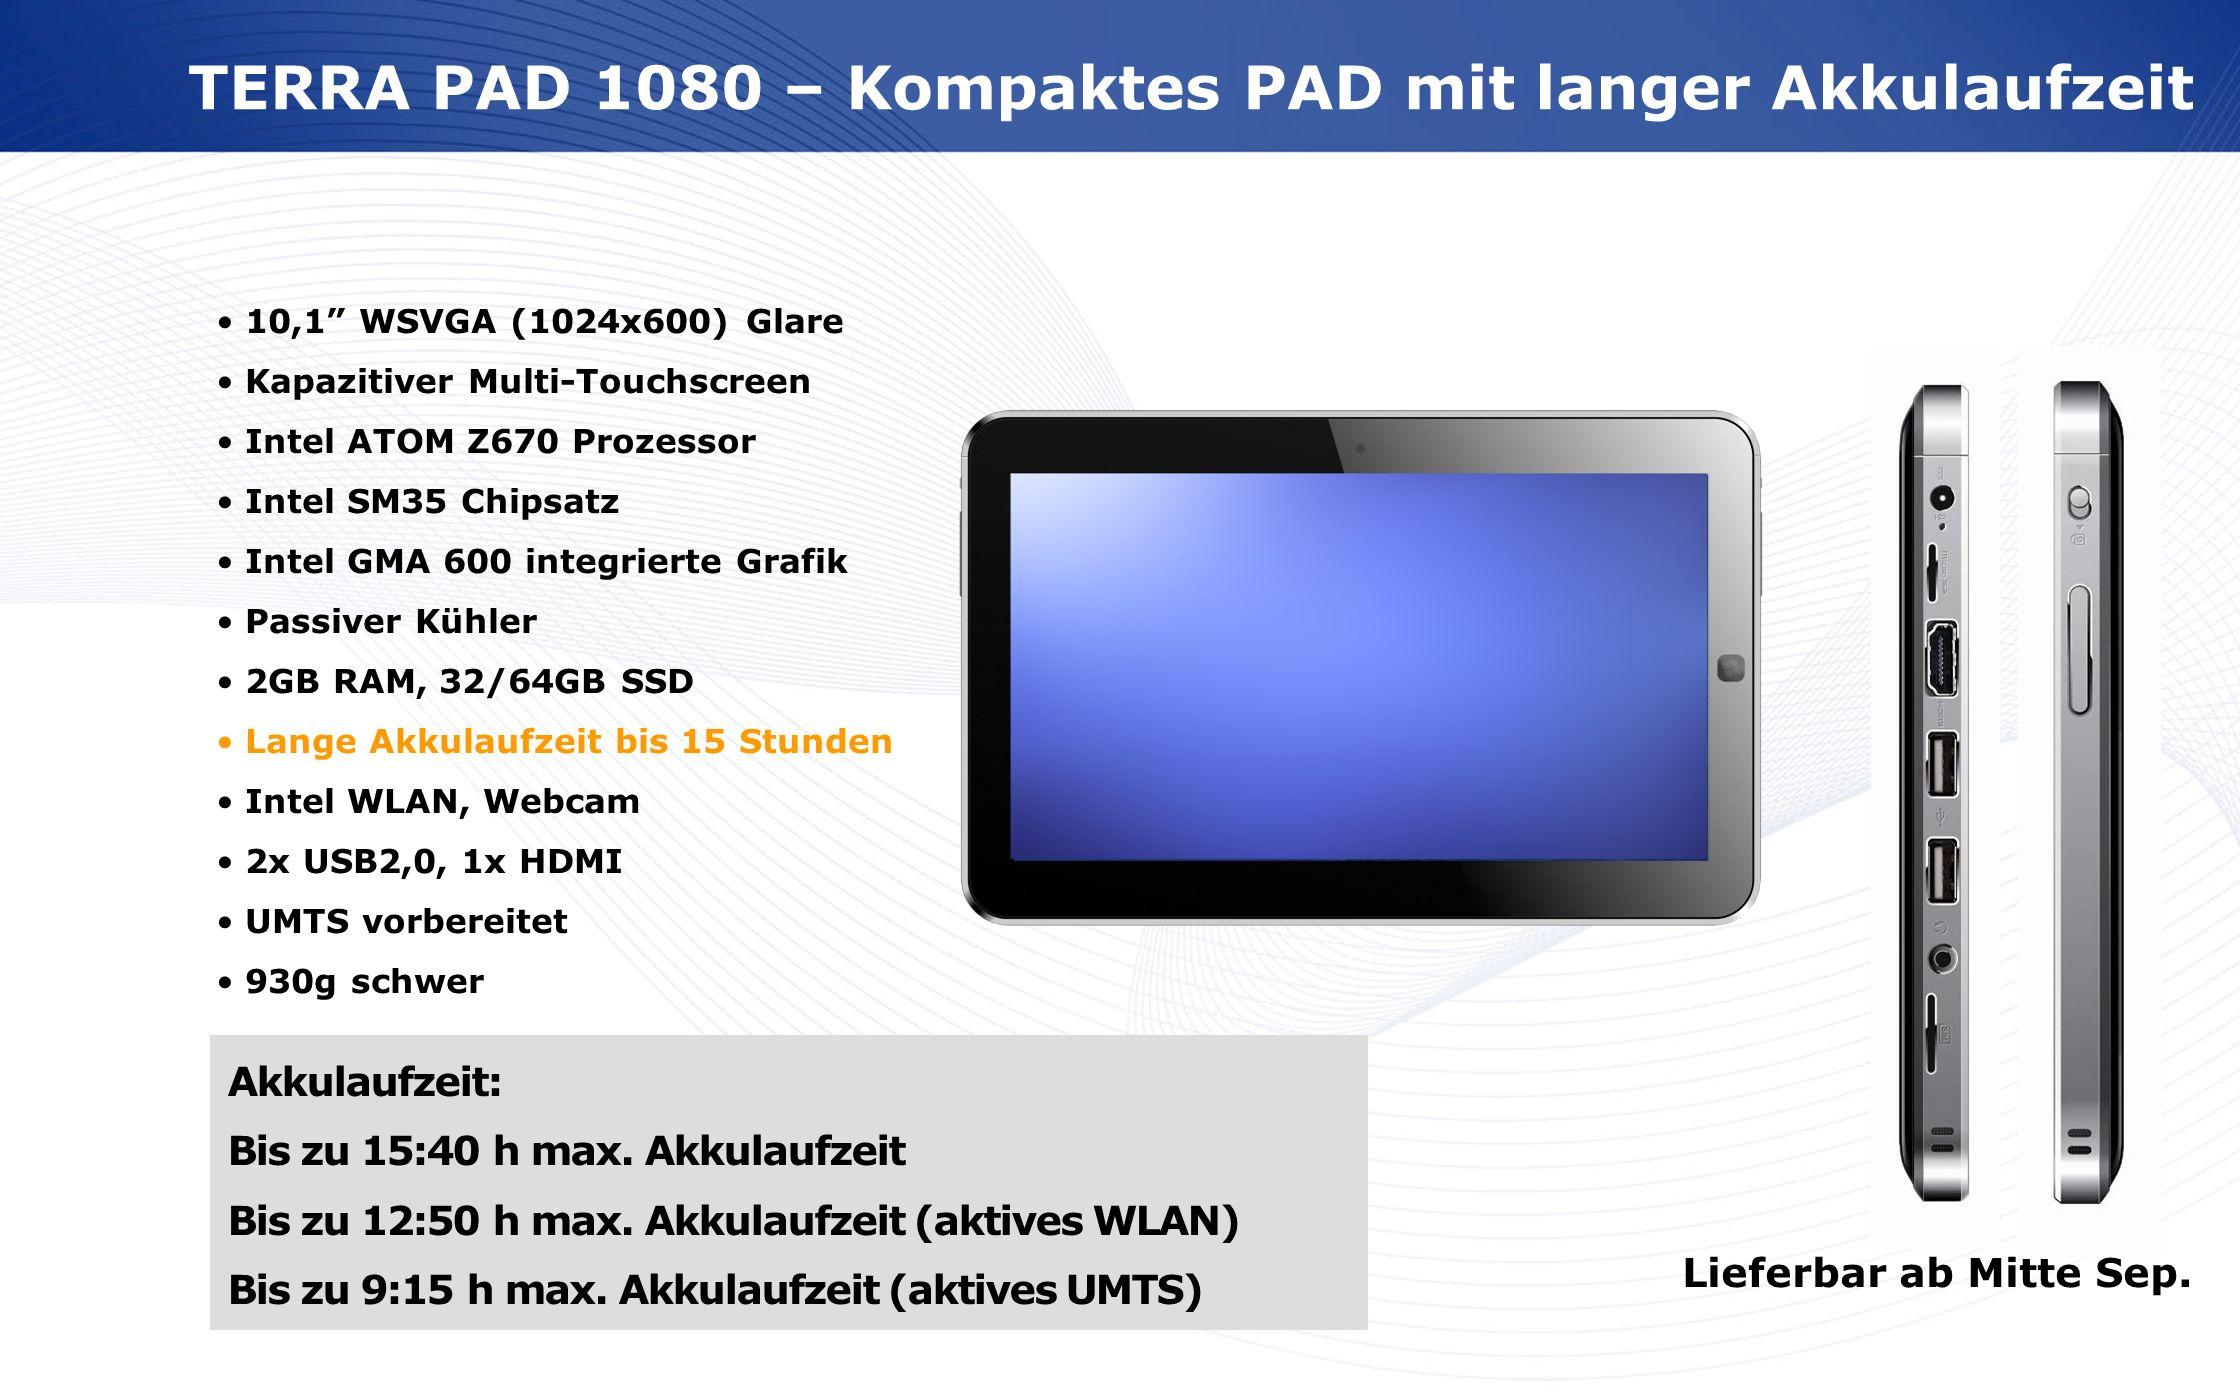 www.wortmann.de TERRA PAD 1080 – Kompaktes PAD mit langer Akkulaufzeit 10,1 WSVGA (1024x600) Glare Kapazitiver Multi-Touchscreen Intel ATOM Z670 Proze